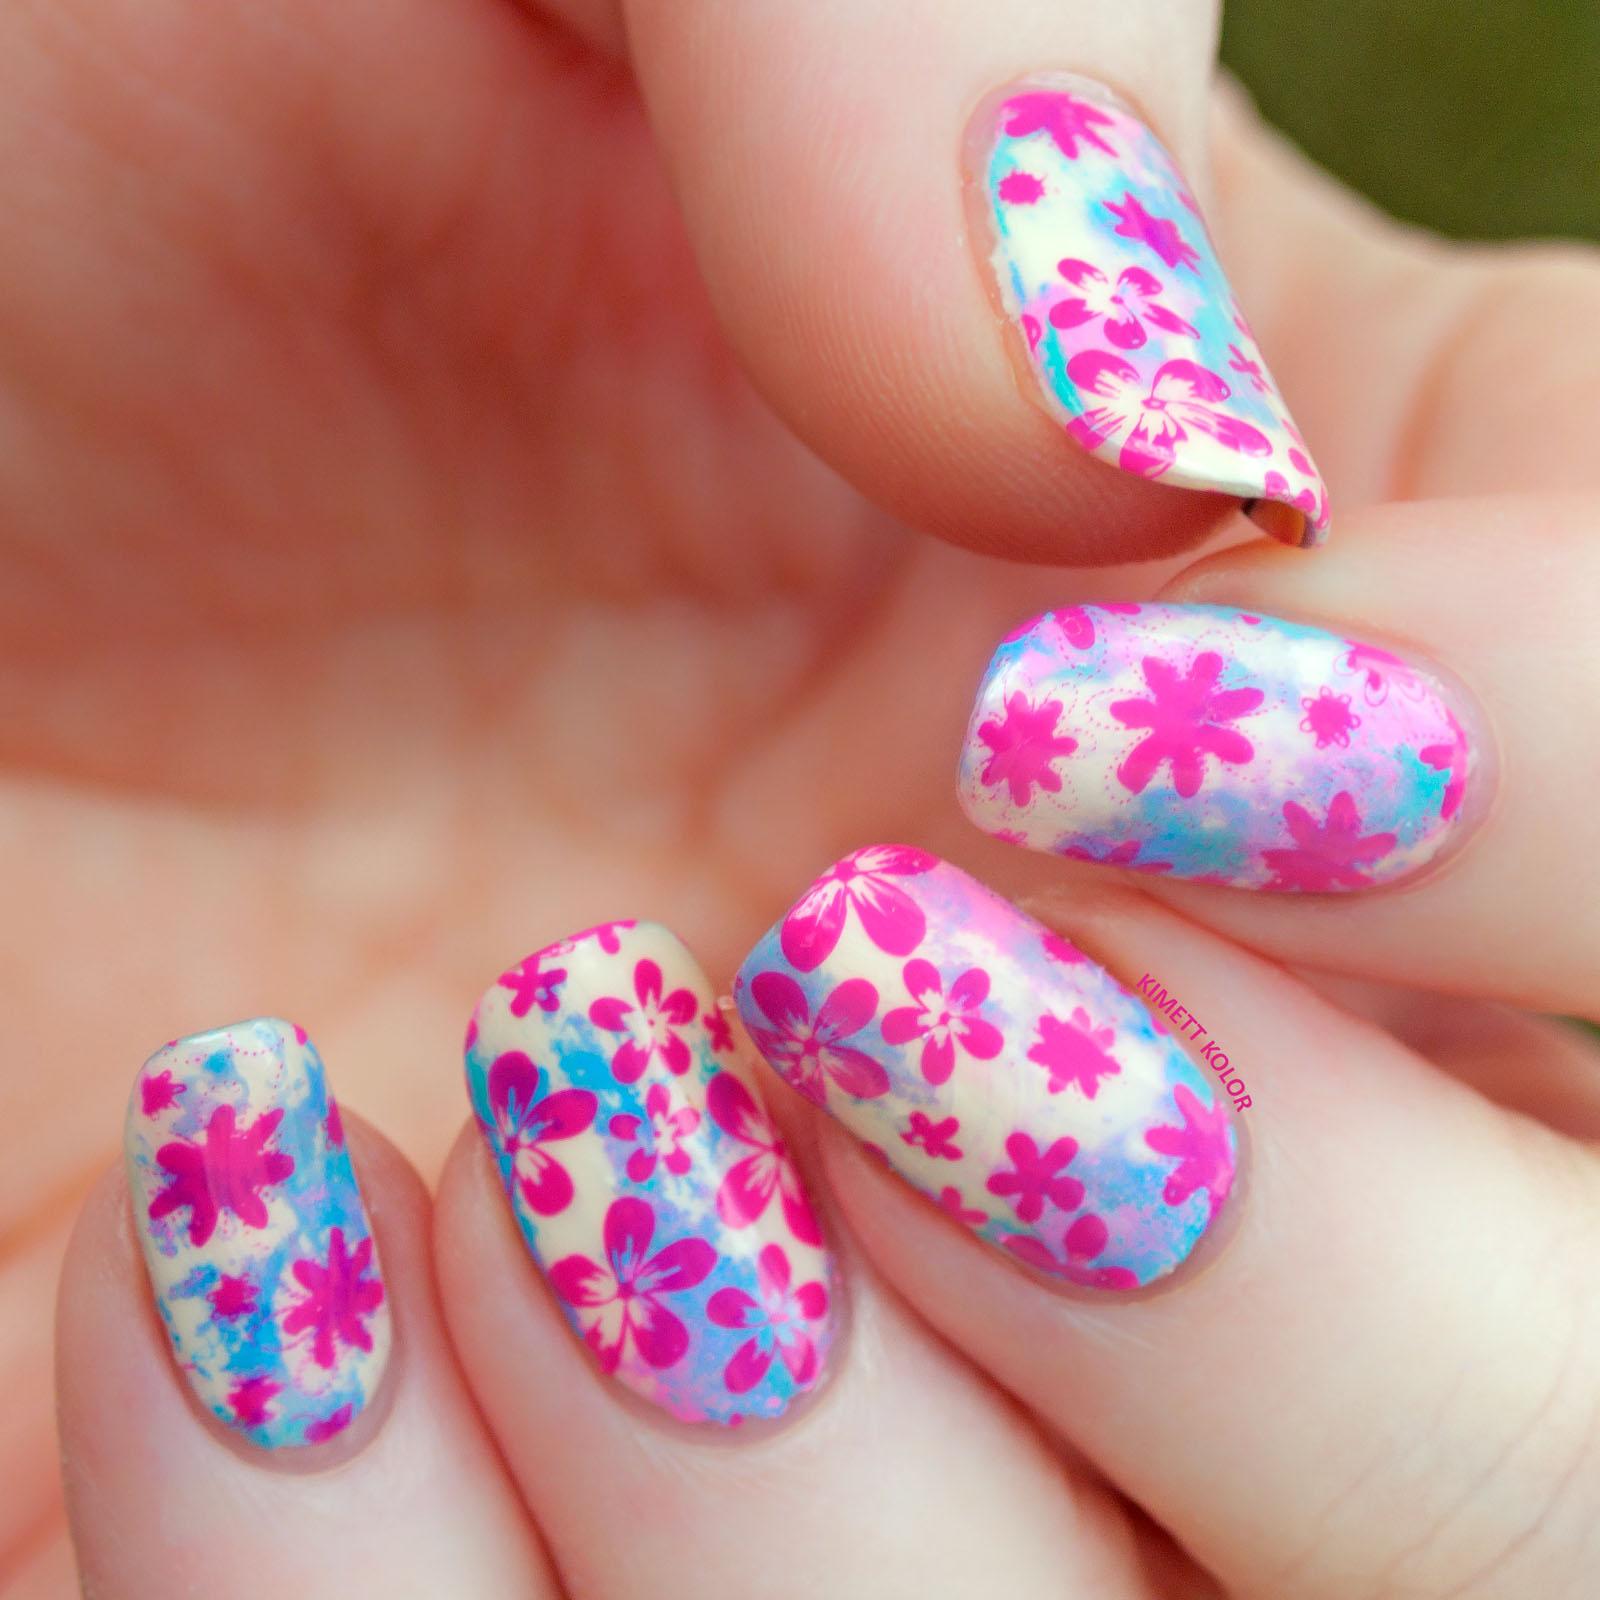 Kimett Kolor Spring Floral Nail Art